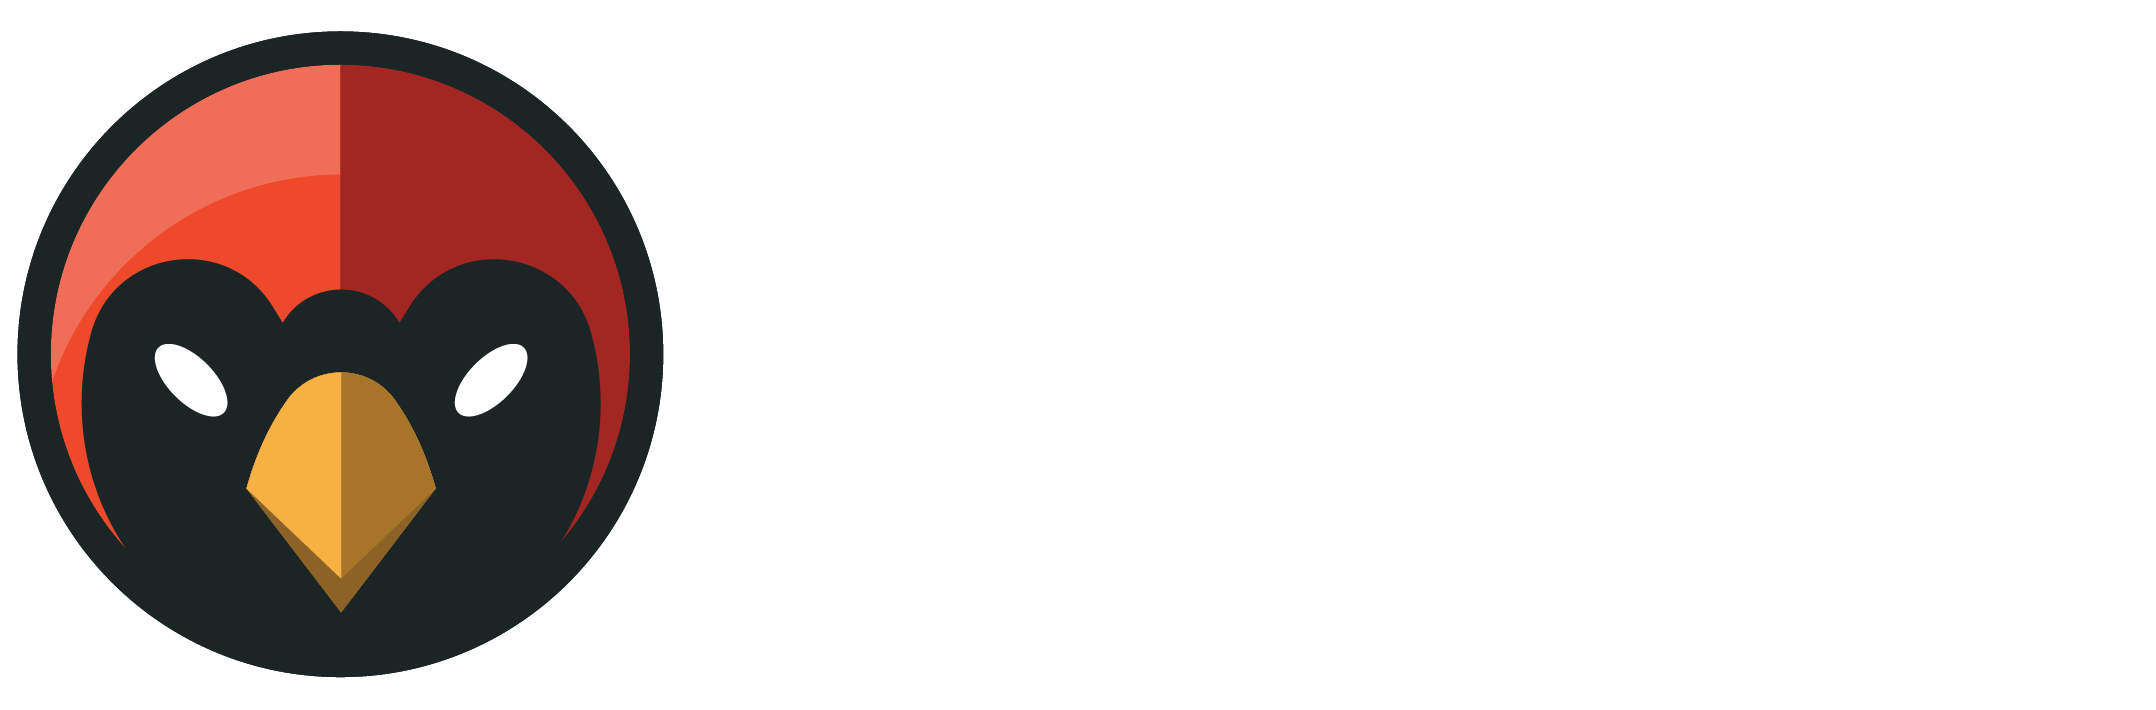 Red Cardinal Music